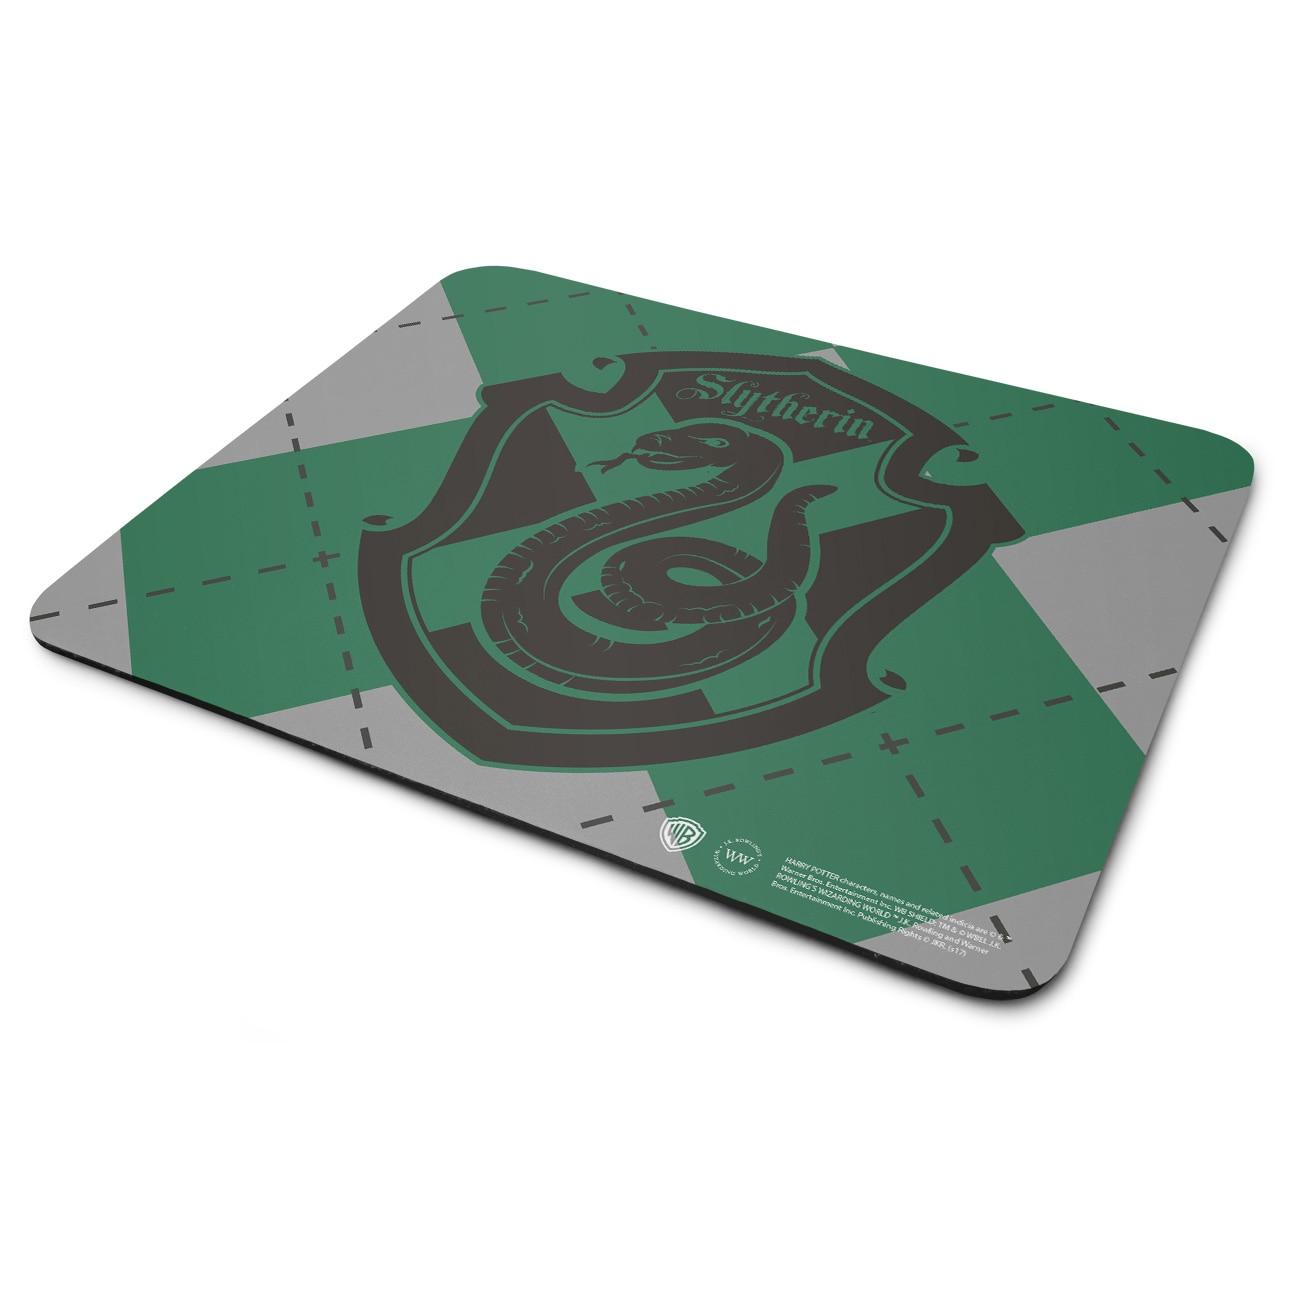 Slytherin Mouse Pad